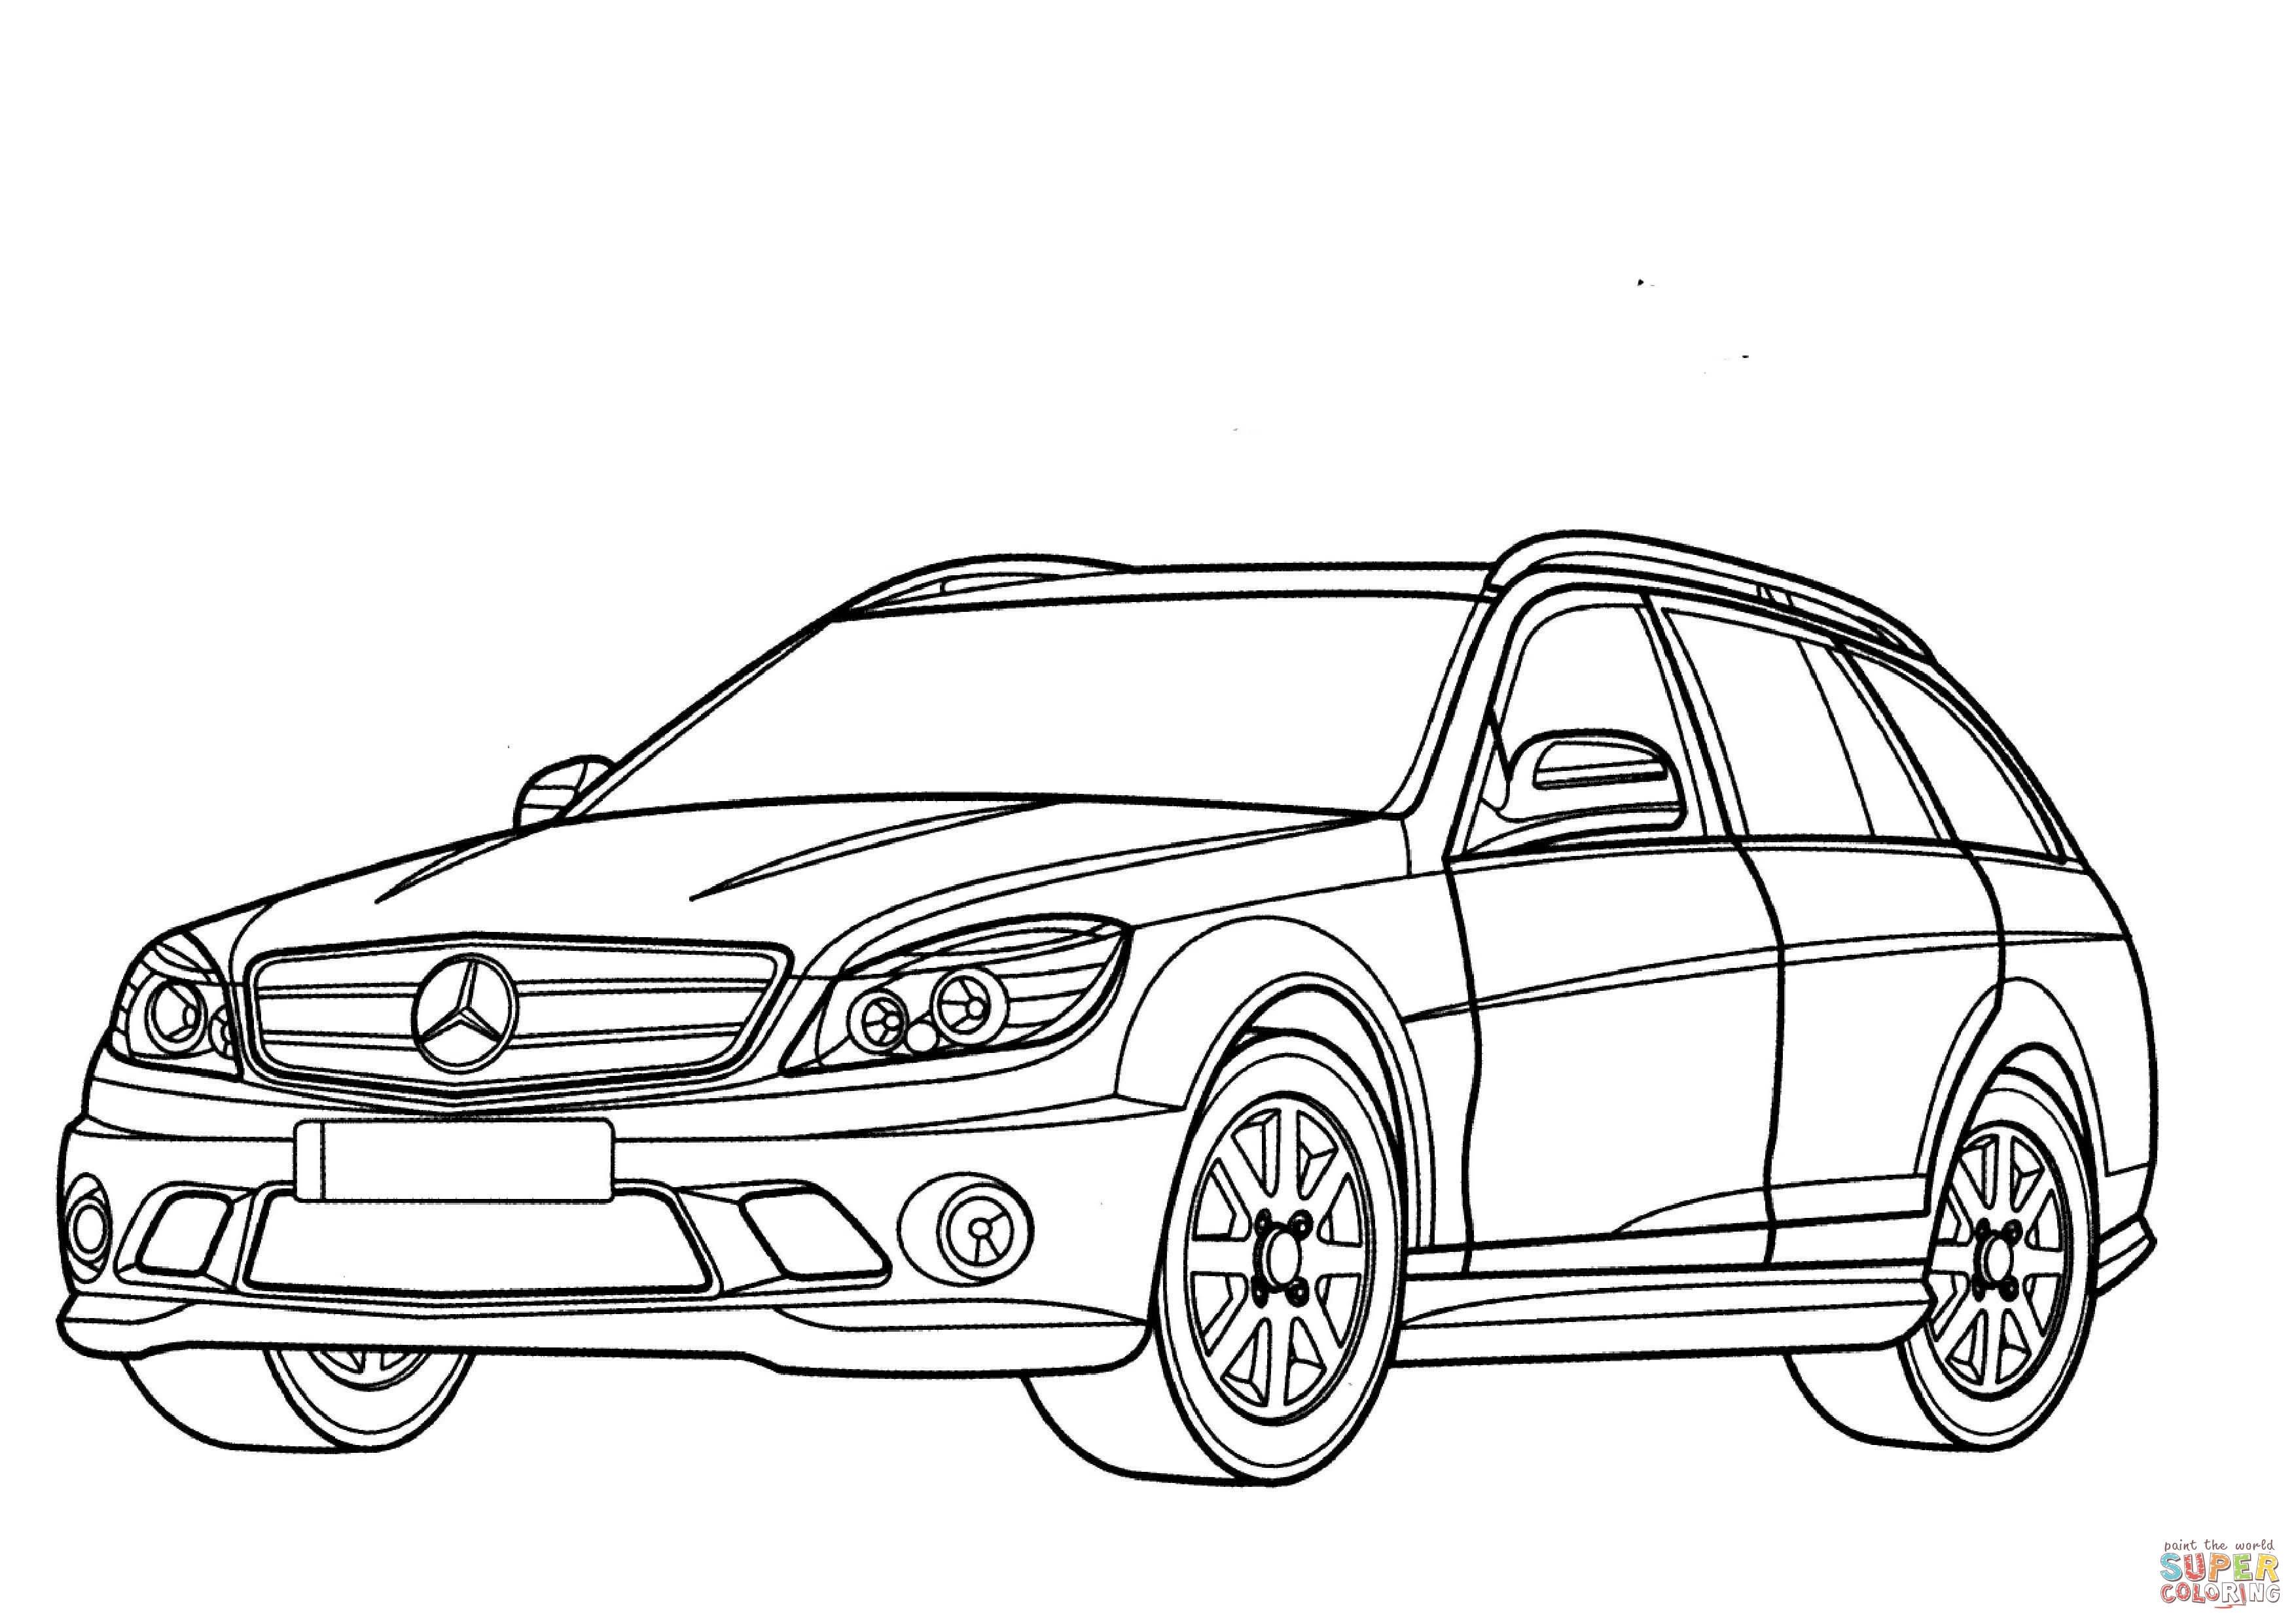 Disegno Di Mercedes Benz Classe C Station Wagon Da